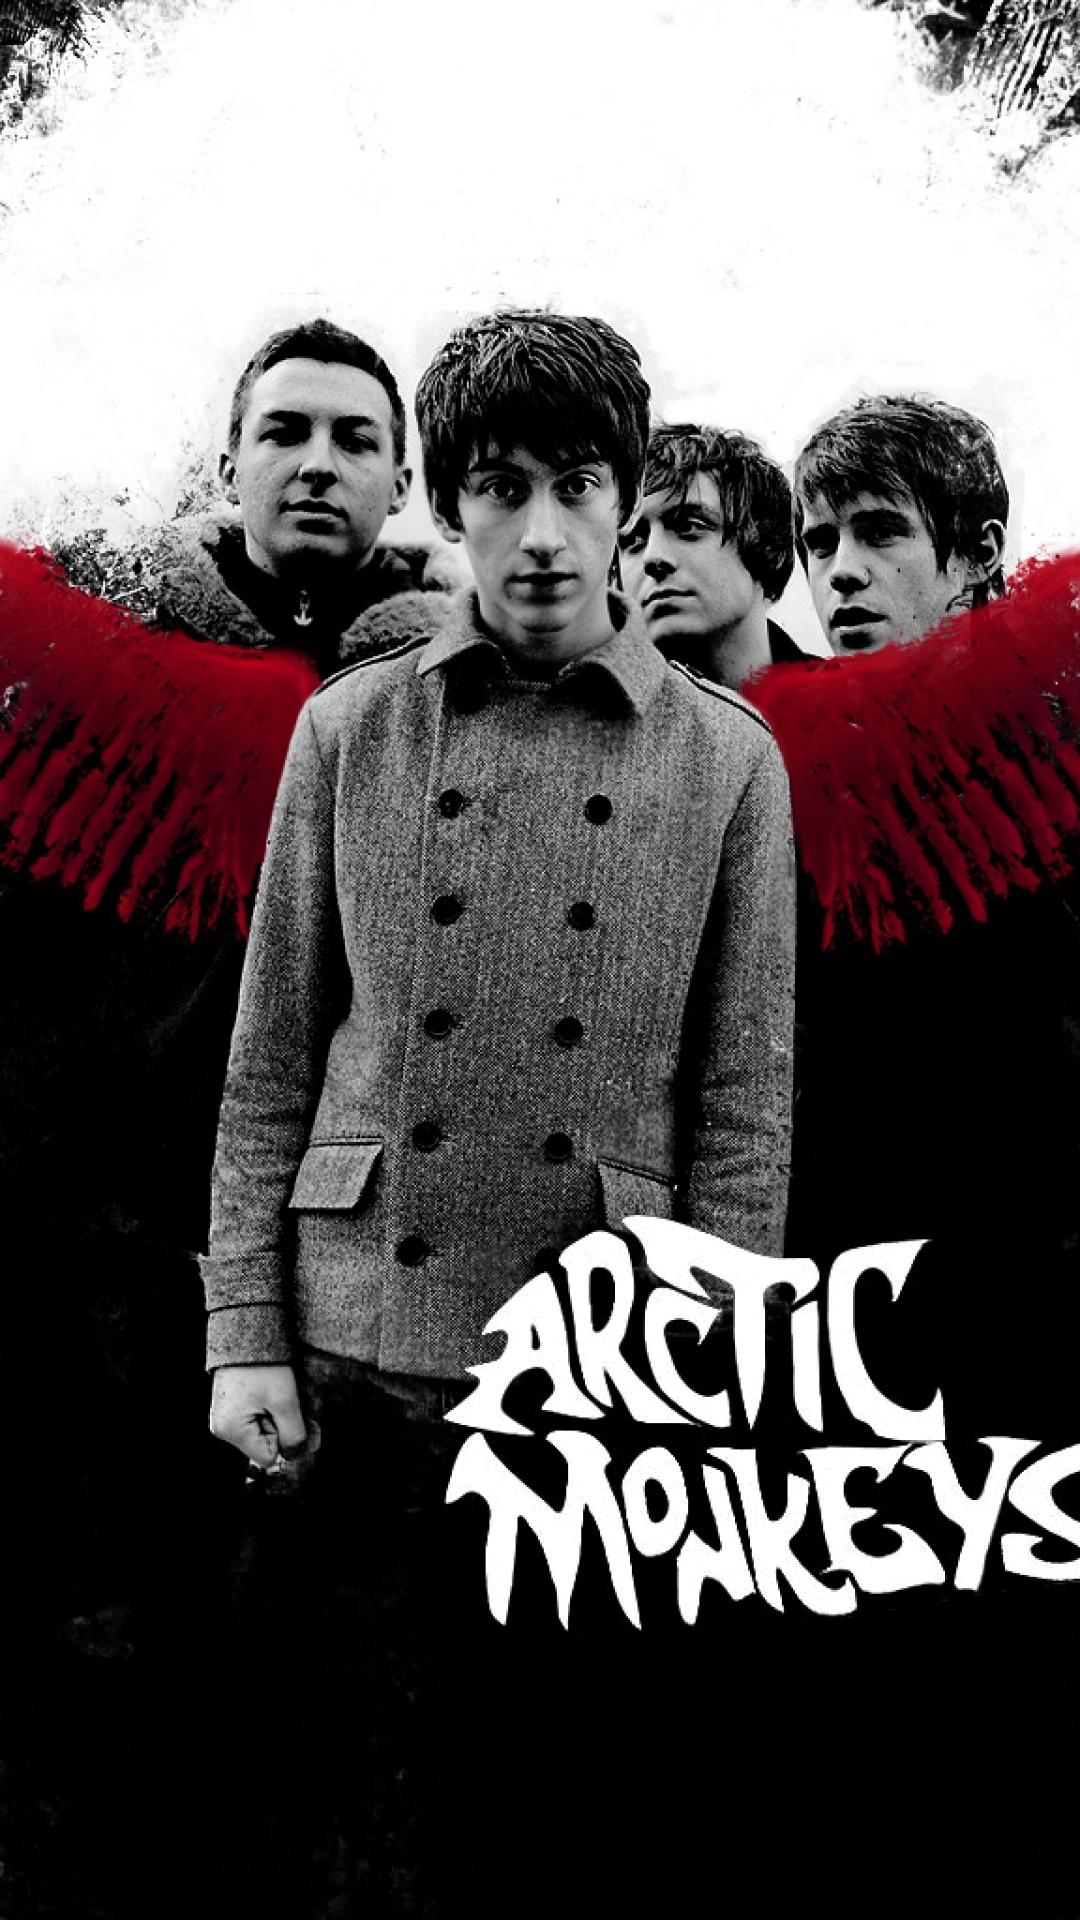 Manchester City Iphone Wallpaper Hd Arctic Monkeys Wallpaper For Mobile Pixelstalk Net